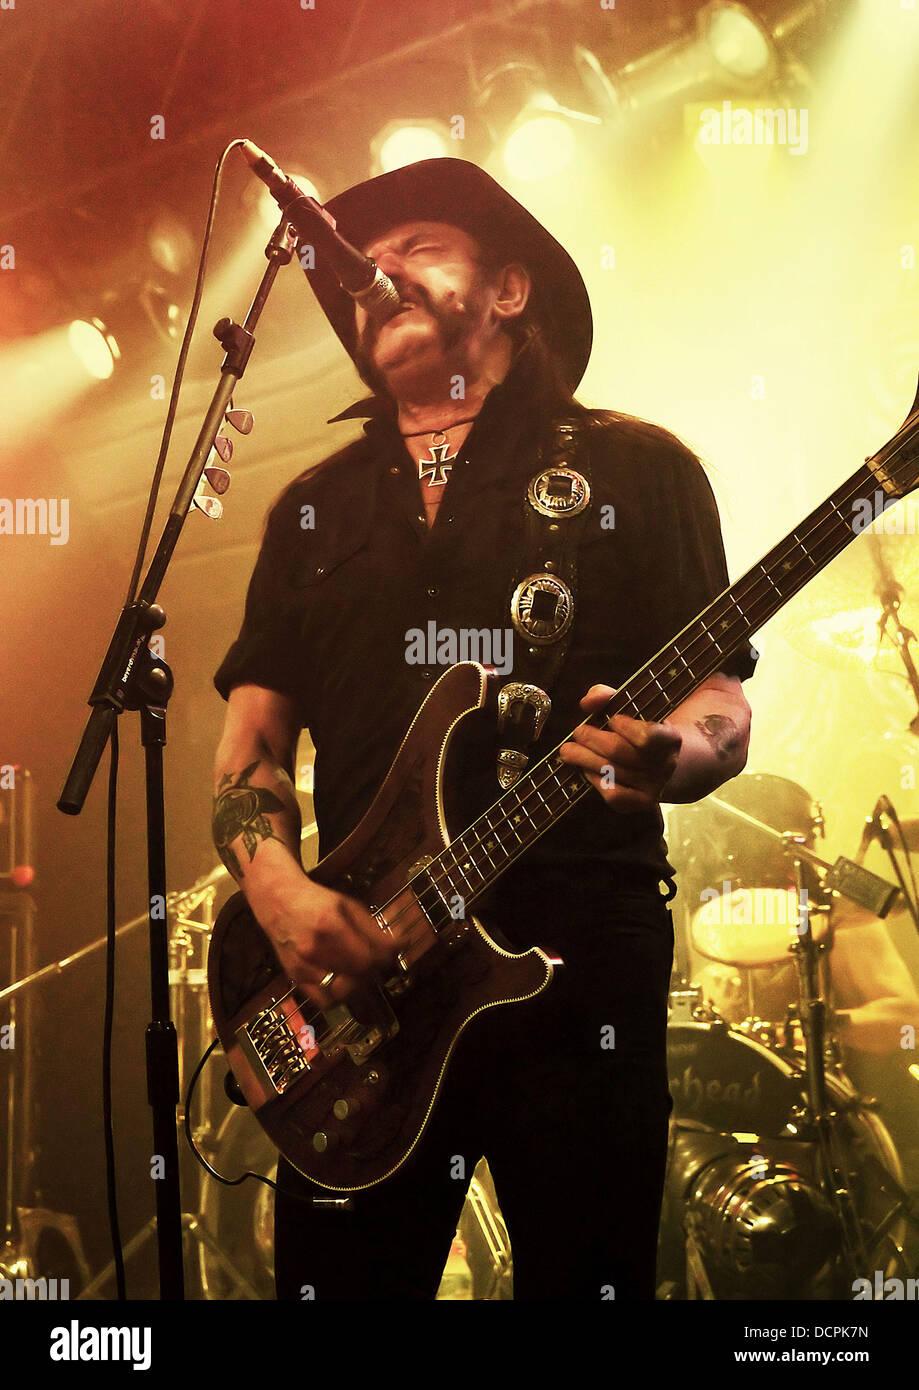 Lemmy Kilmister of Motorhead performing on their 'The World